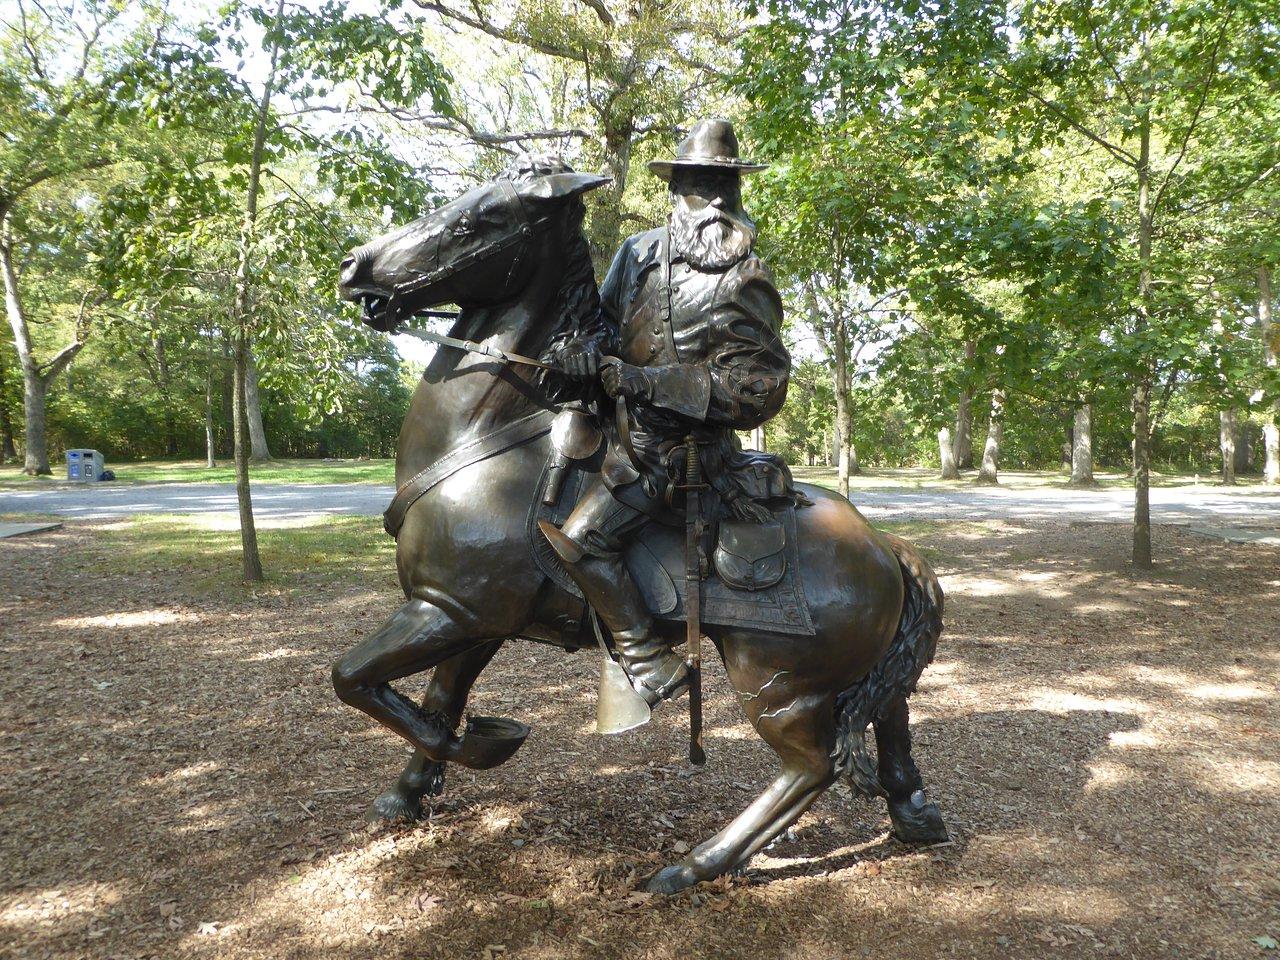 bronze equestrian statue of Confederate General James Longstreet at Pitzer Woods near Gettysburg, Pennsylvania